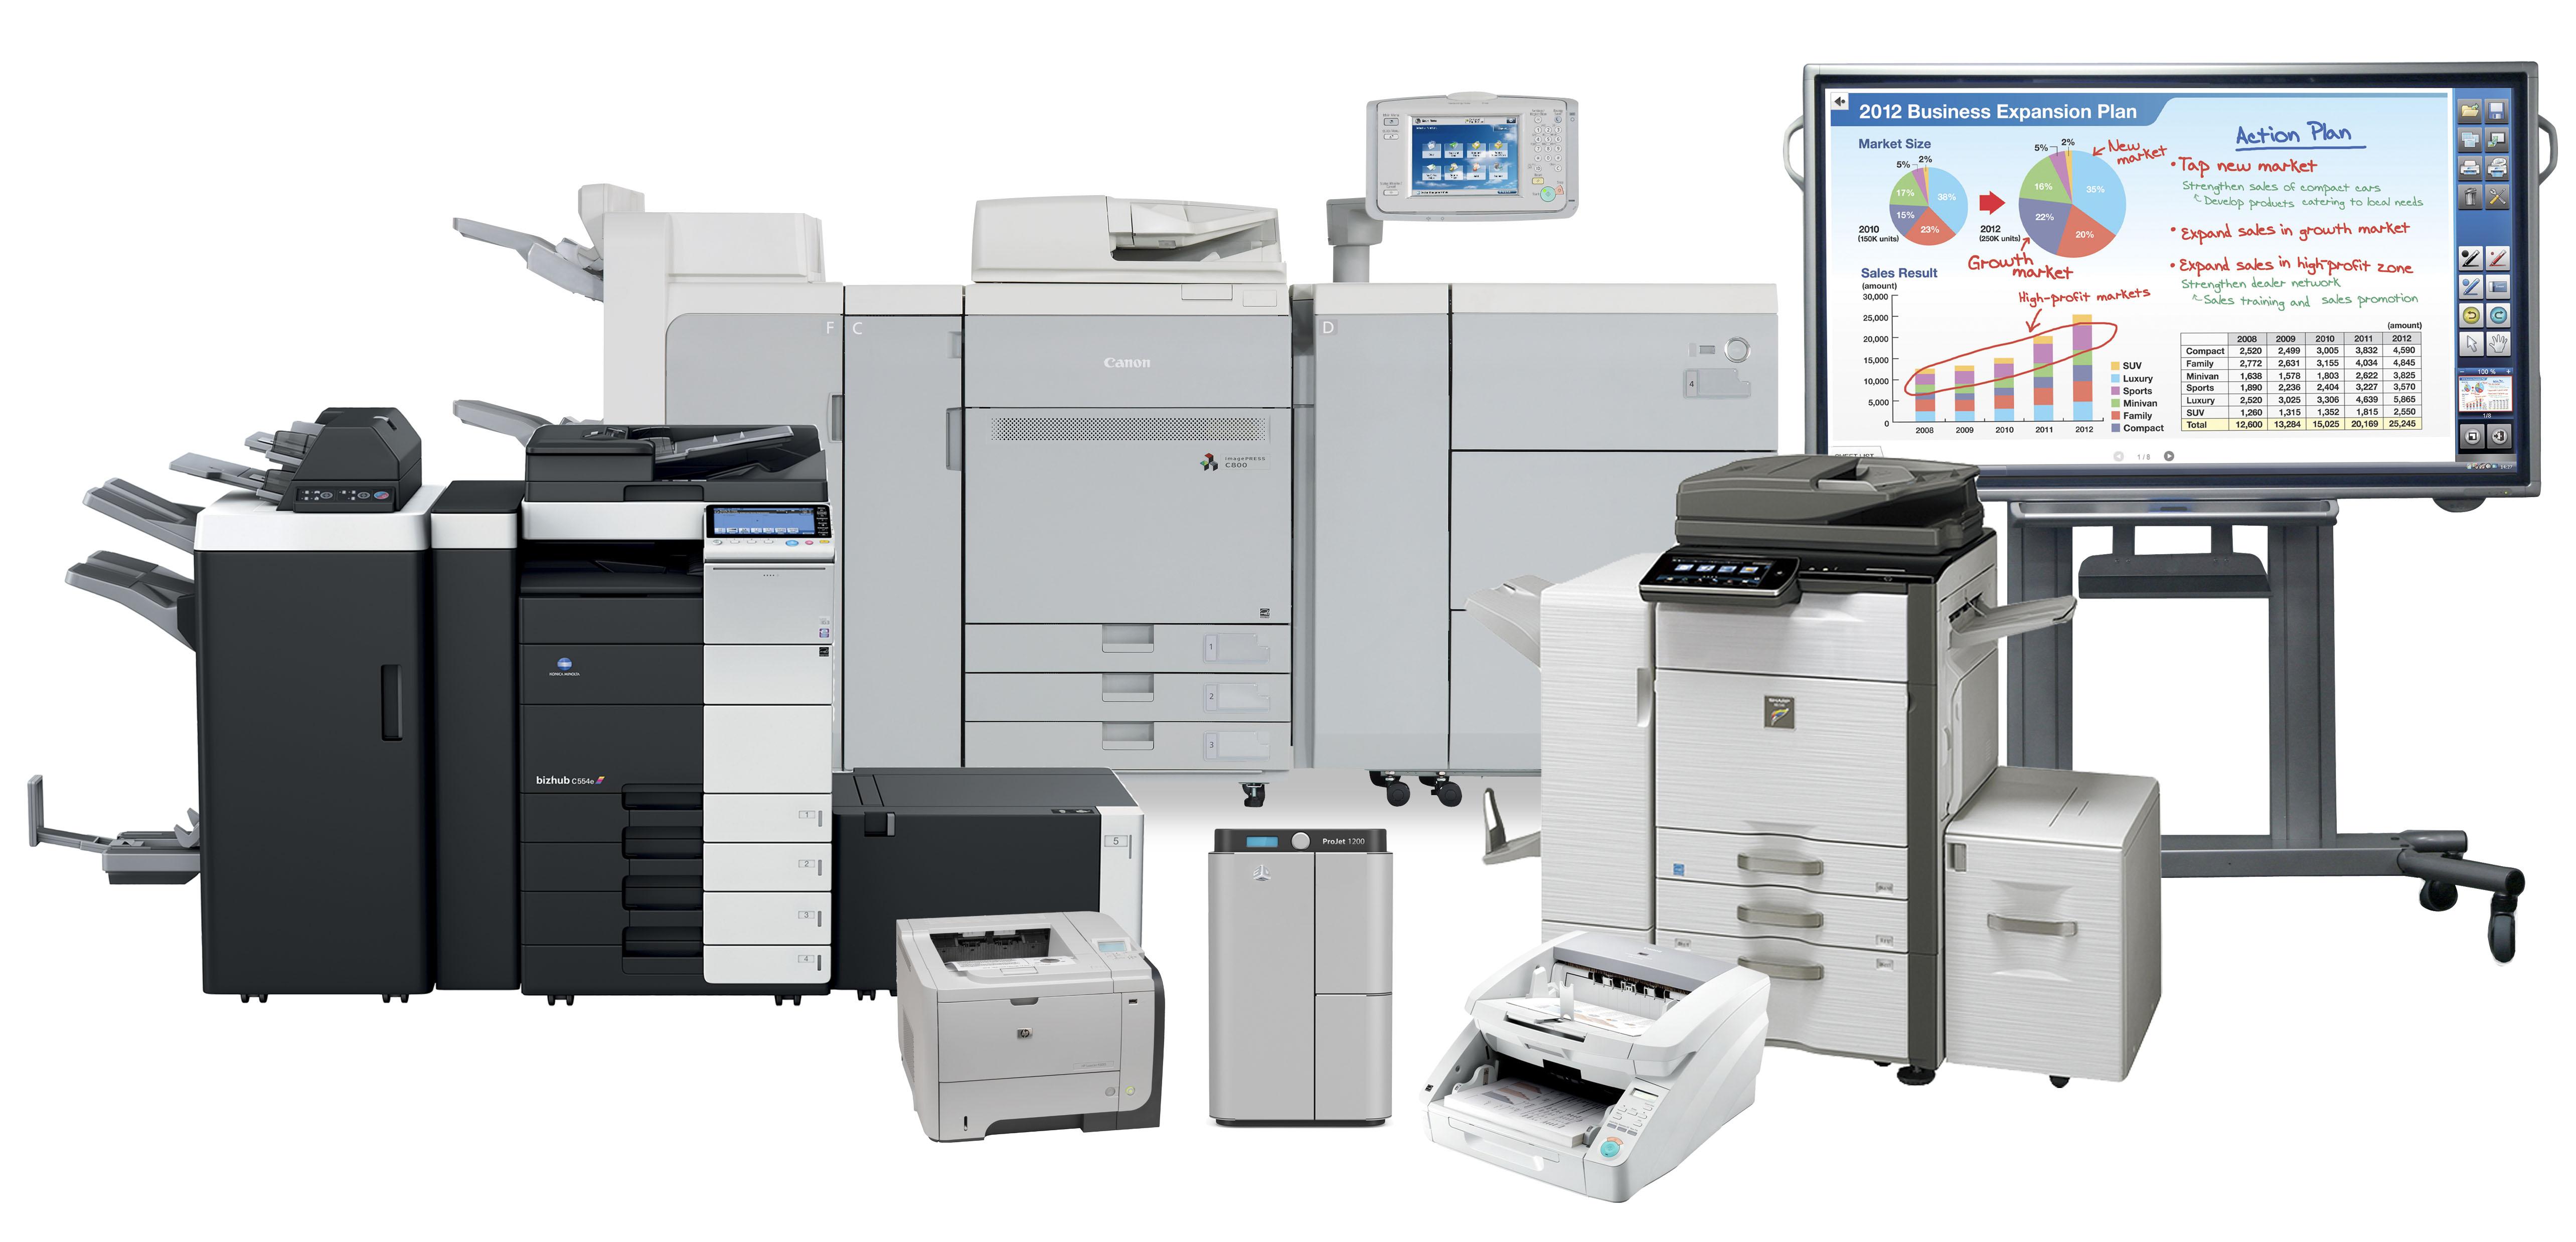 sharp fax scan valley equipment sharpmx systems print office copy